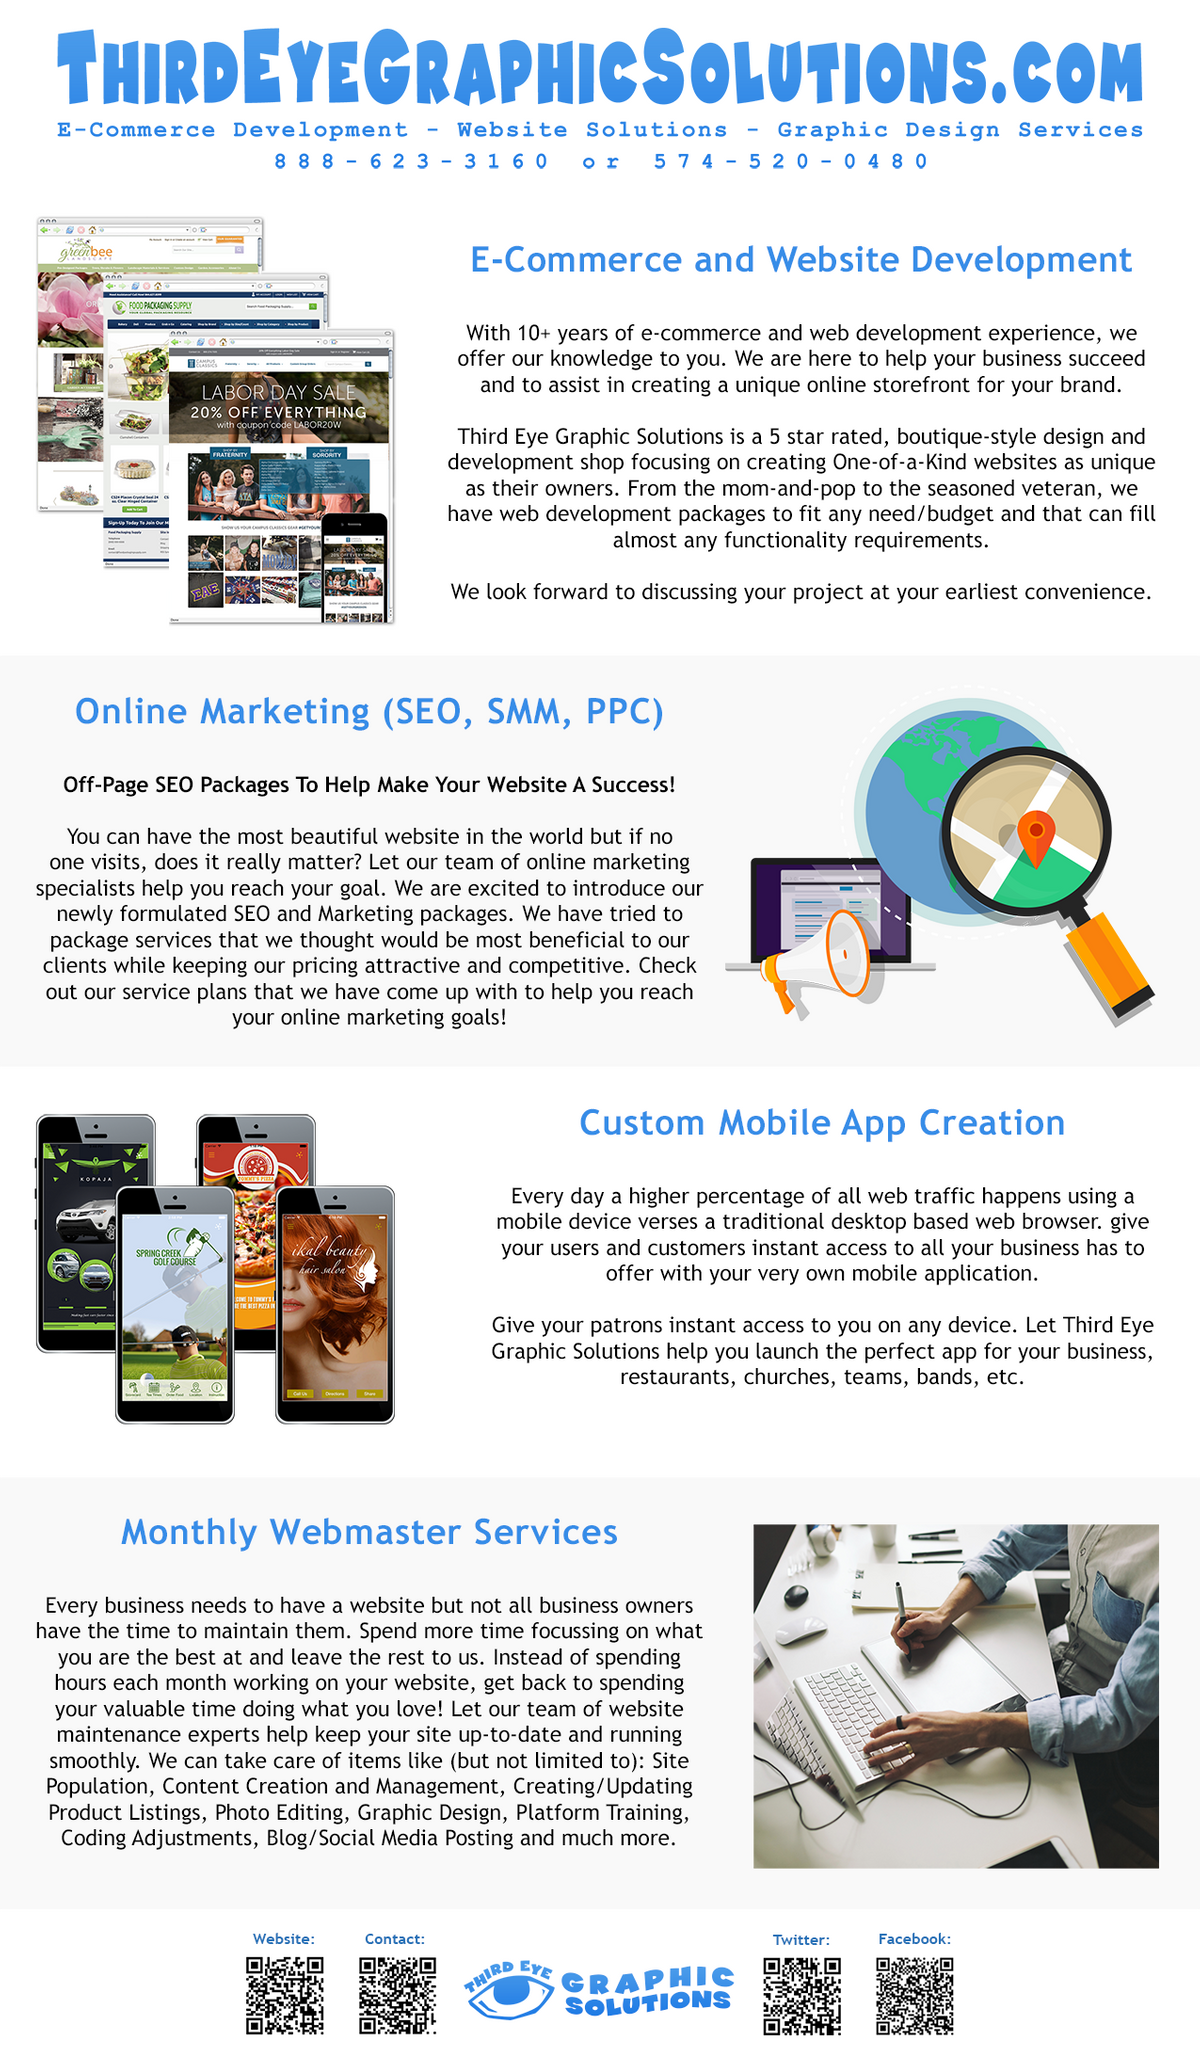 TEGS-SalesRepInfoSheet.png